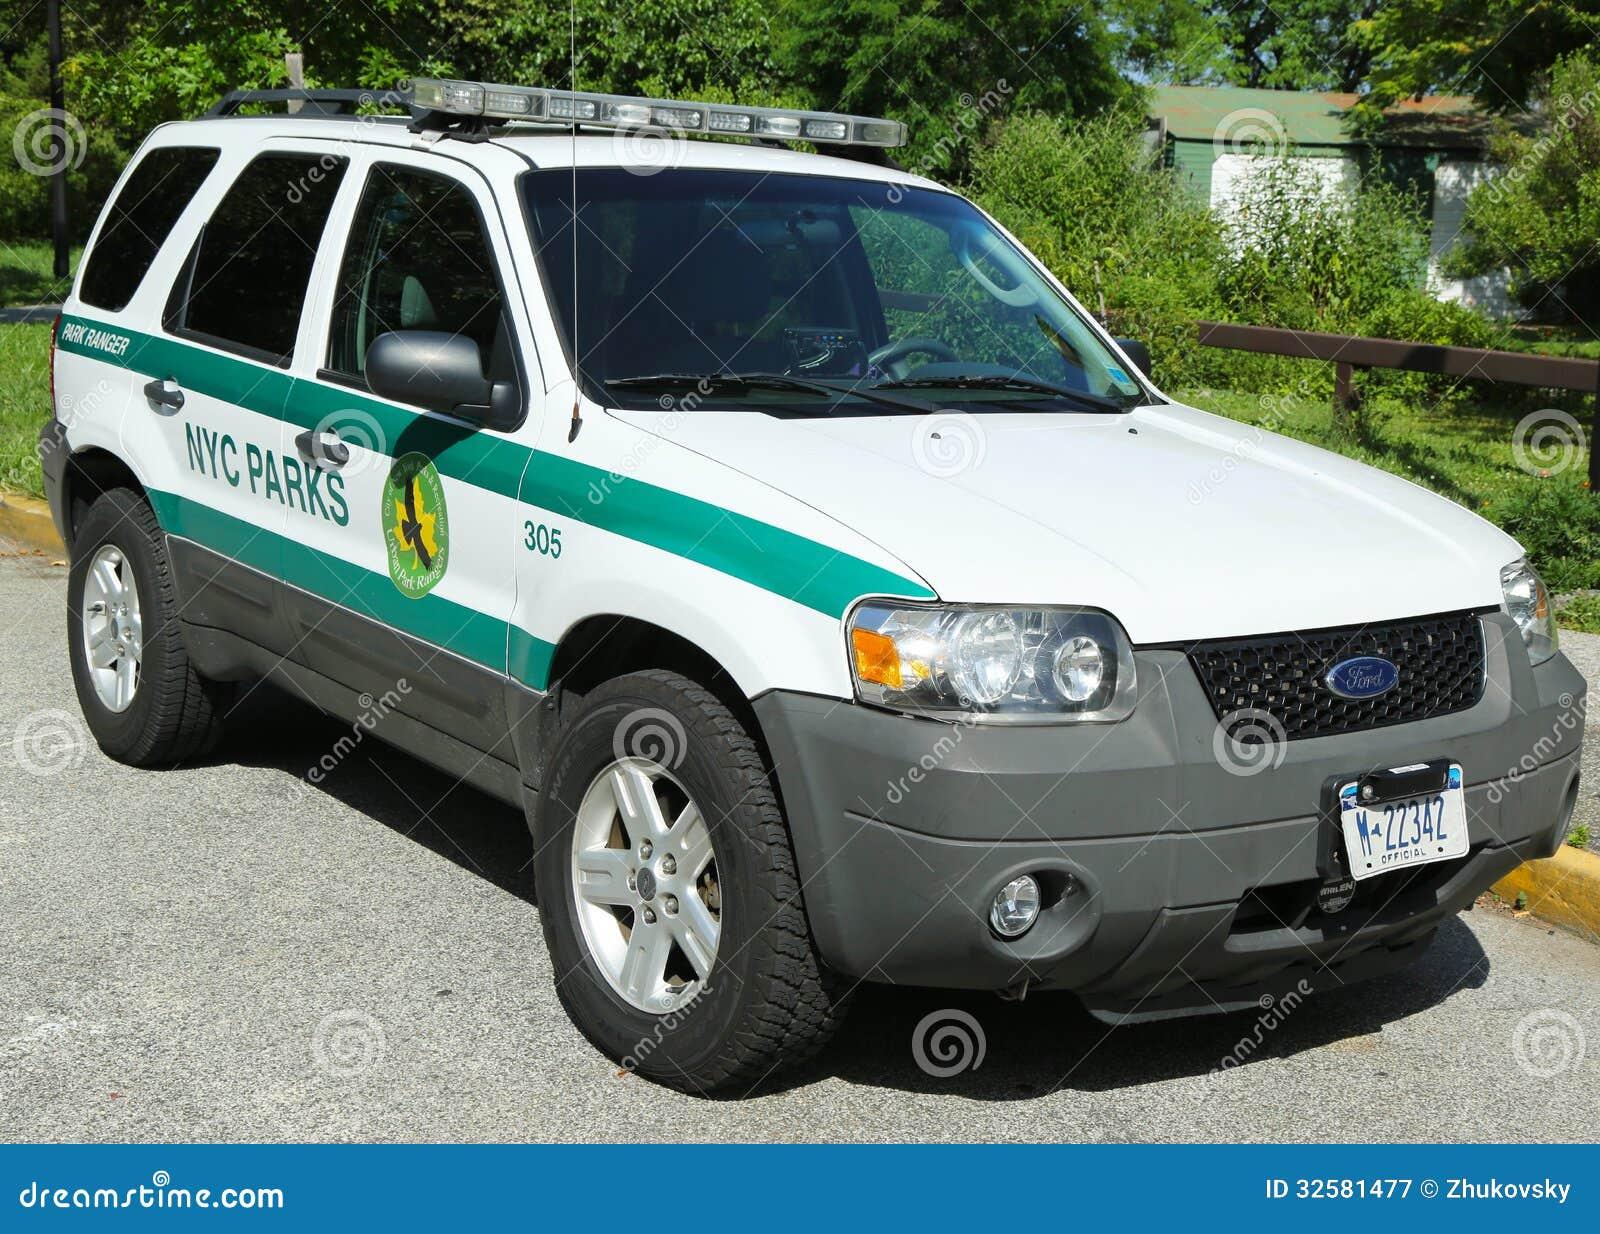 brooklyn new york july 14 us park ranger car in nyc park in brooklyn